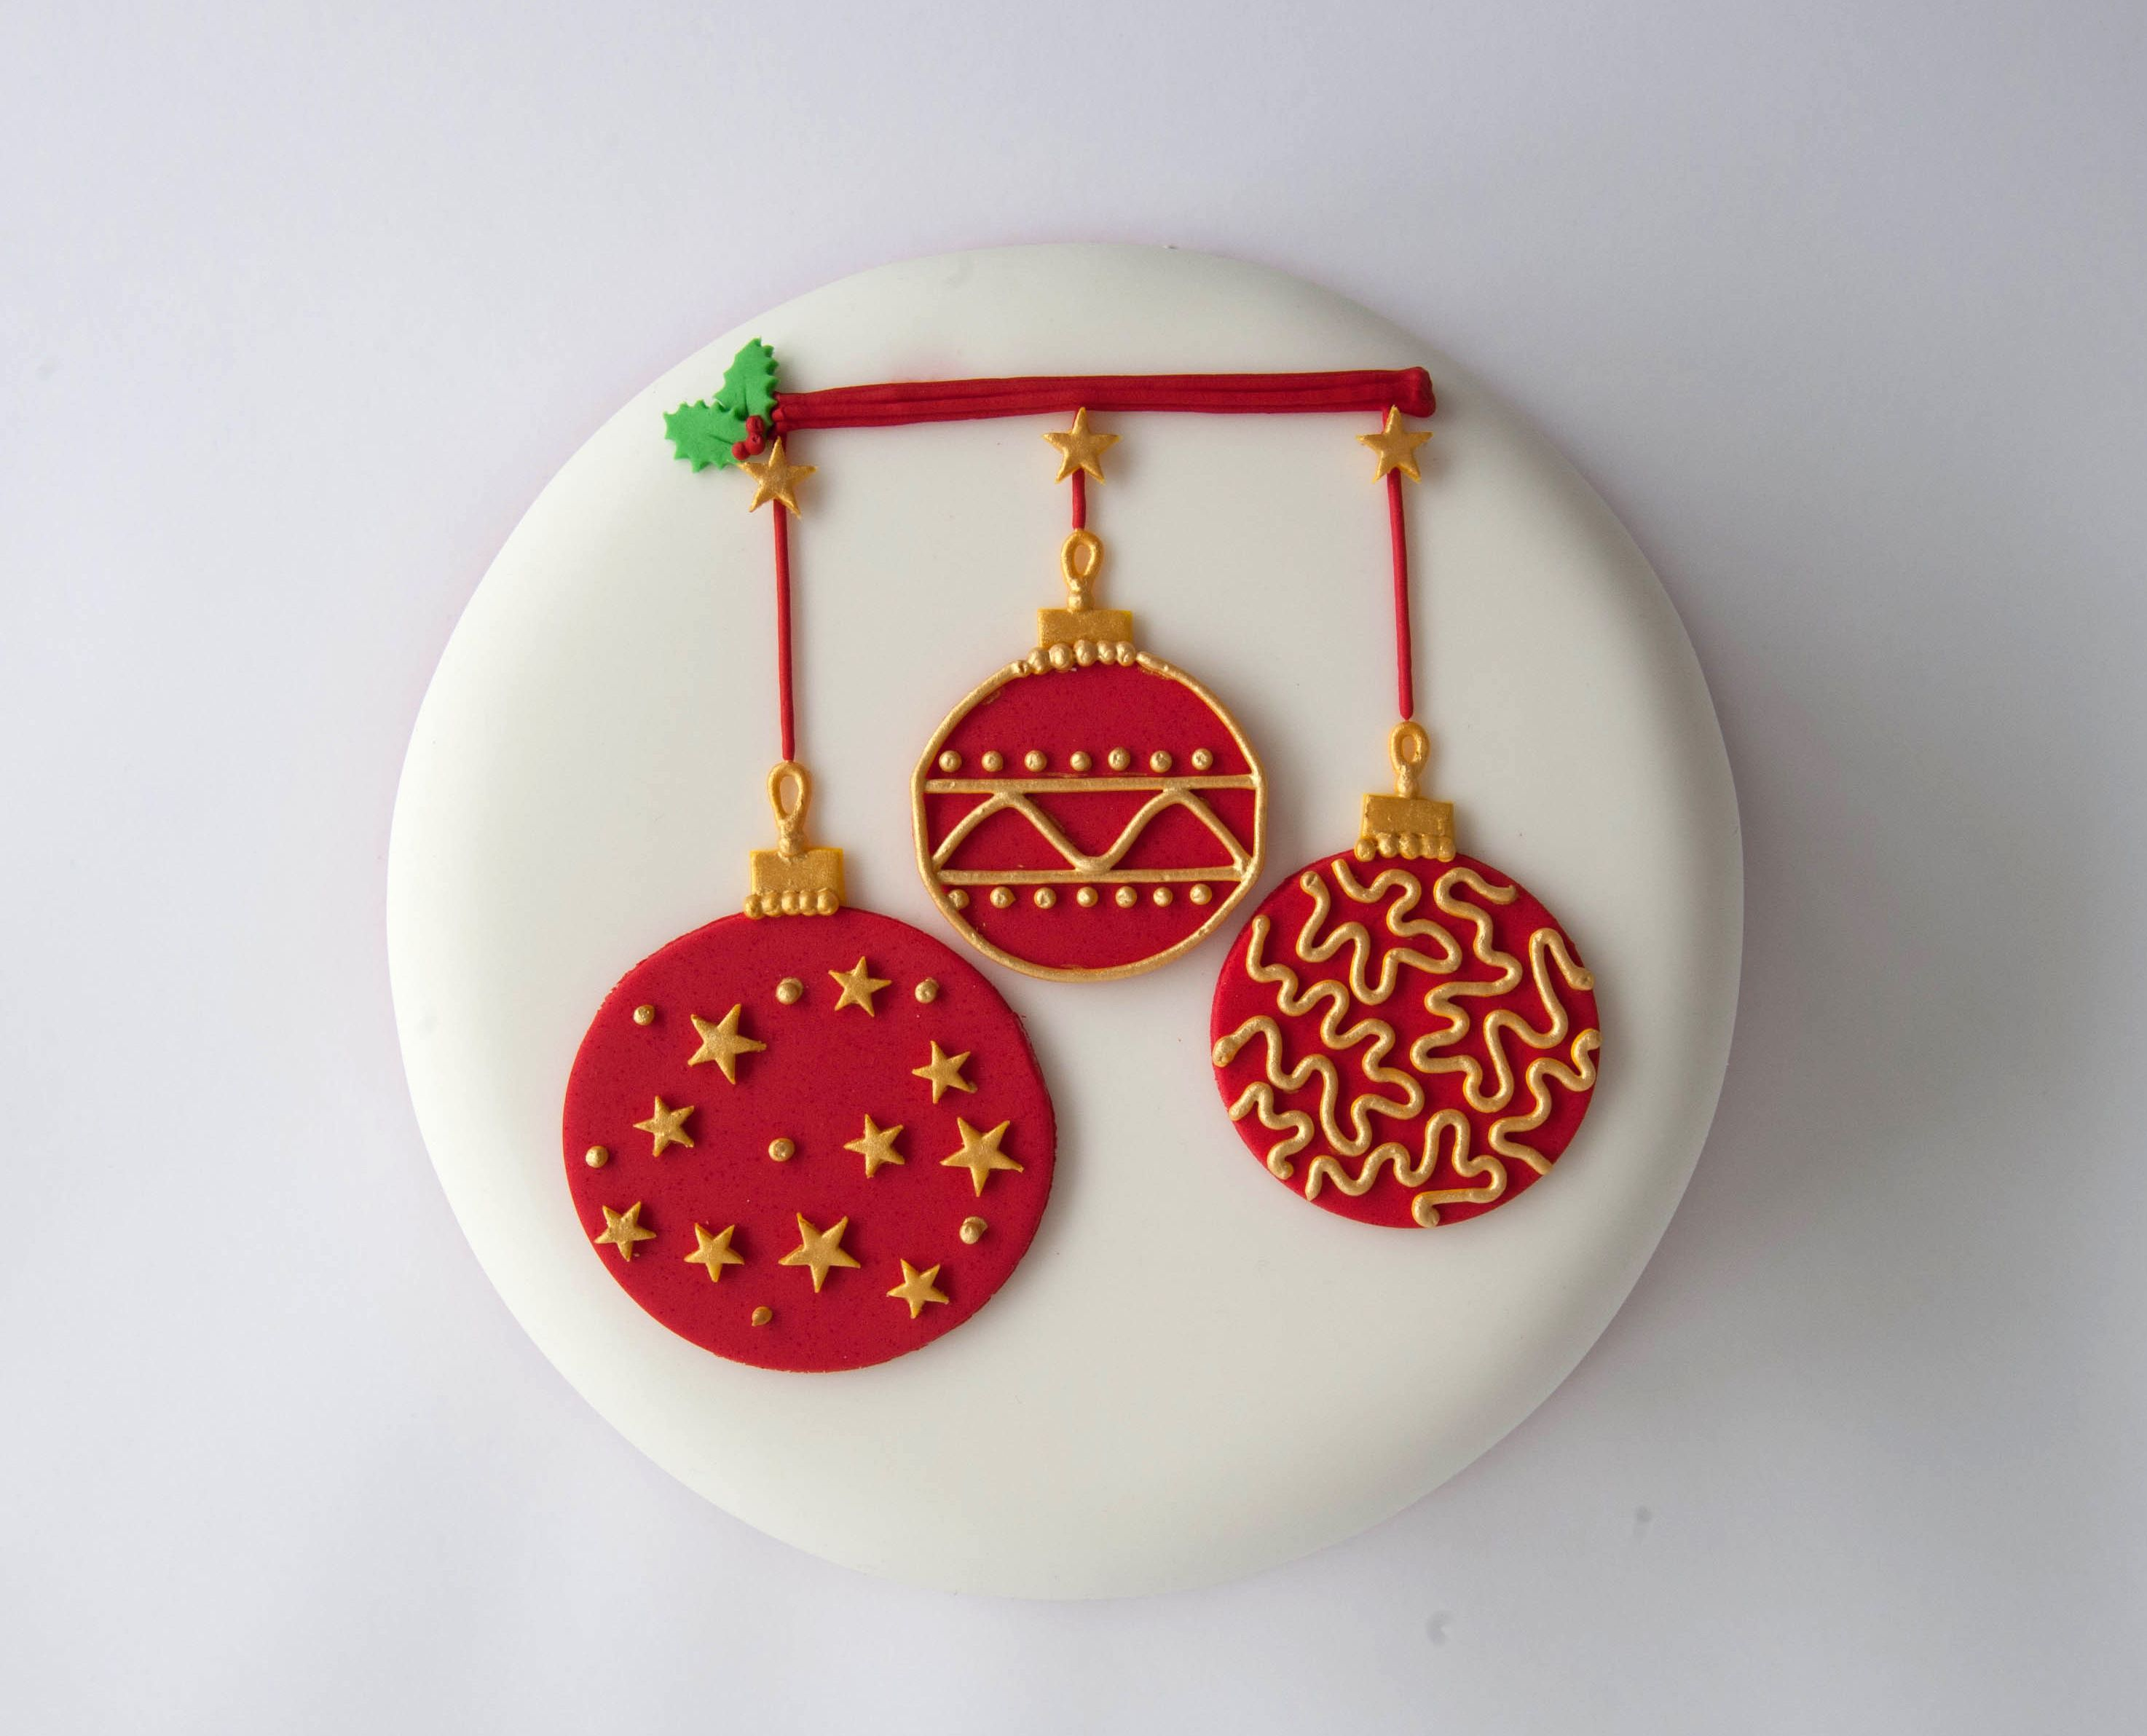 Day 1 Christmas Cake Decorating